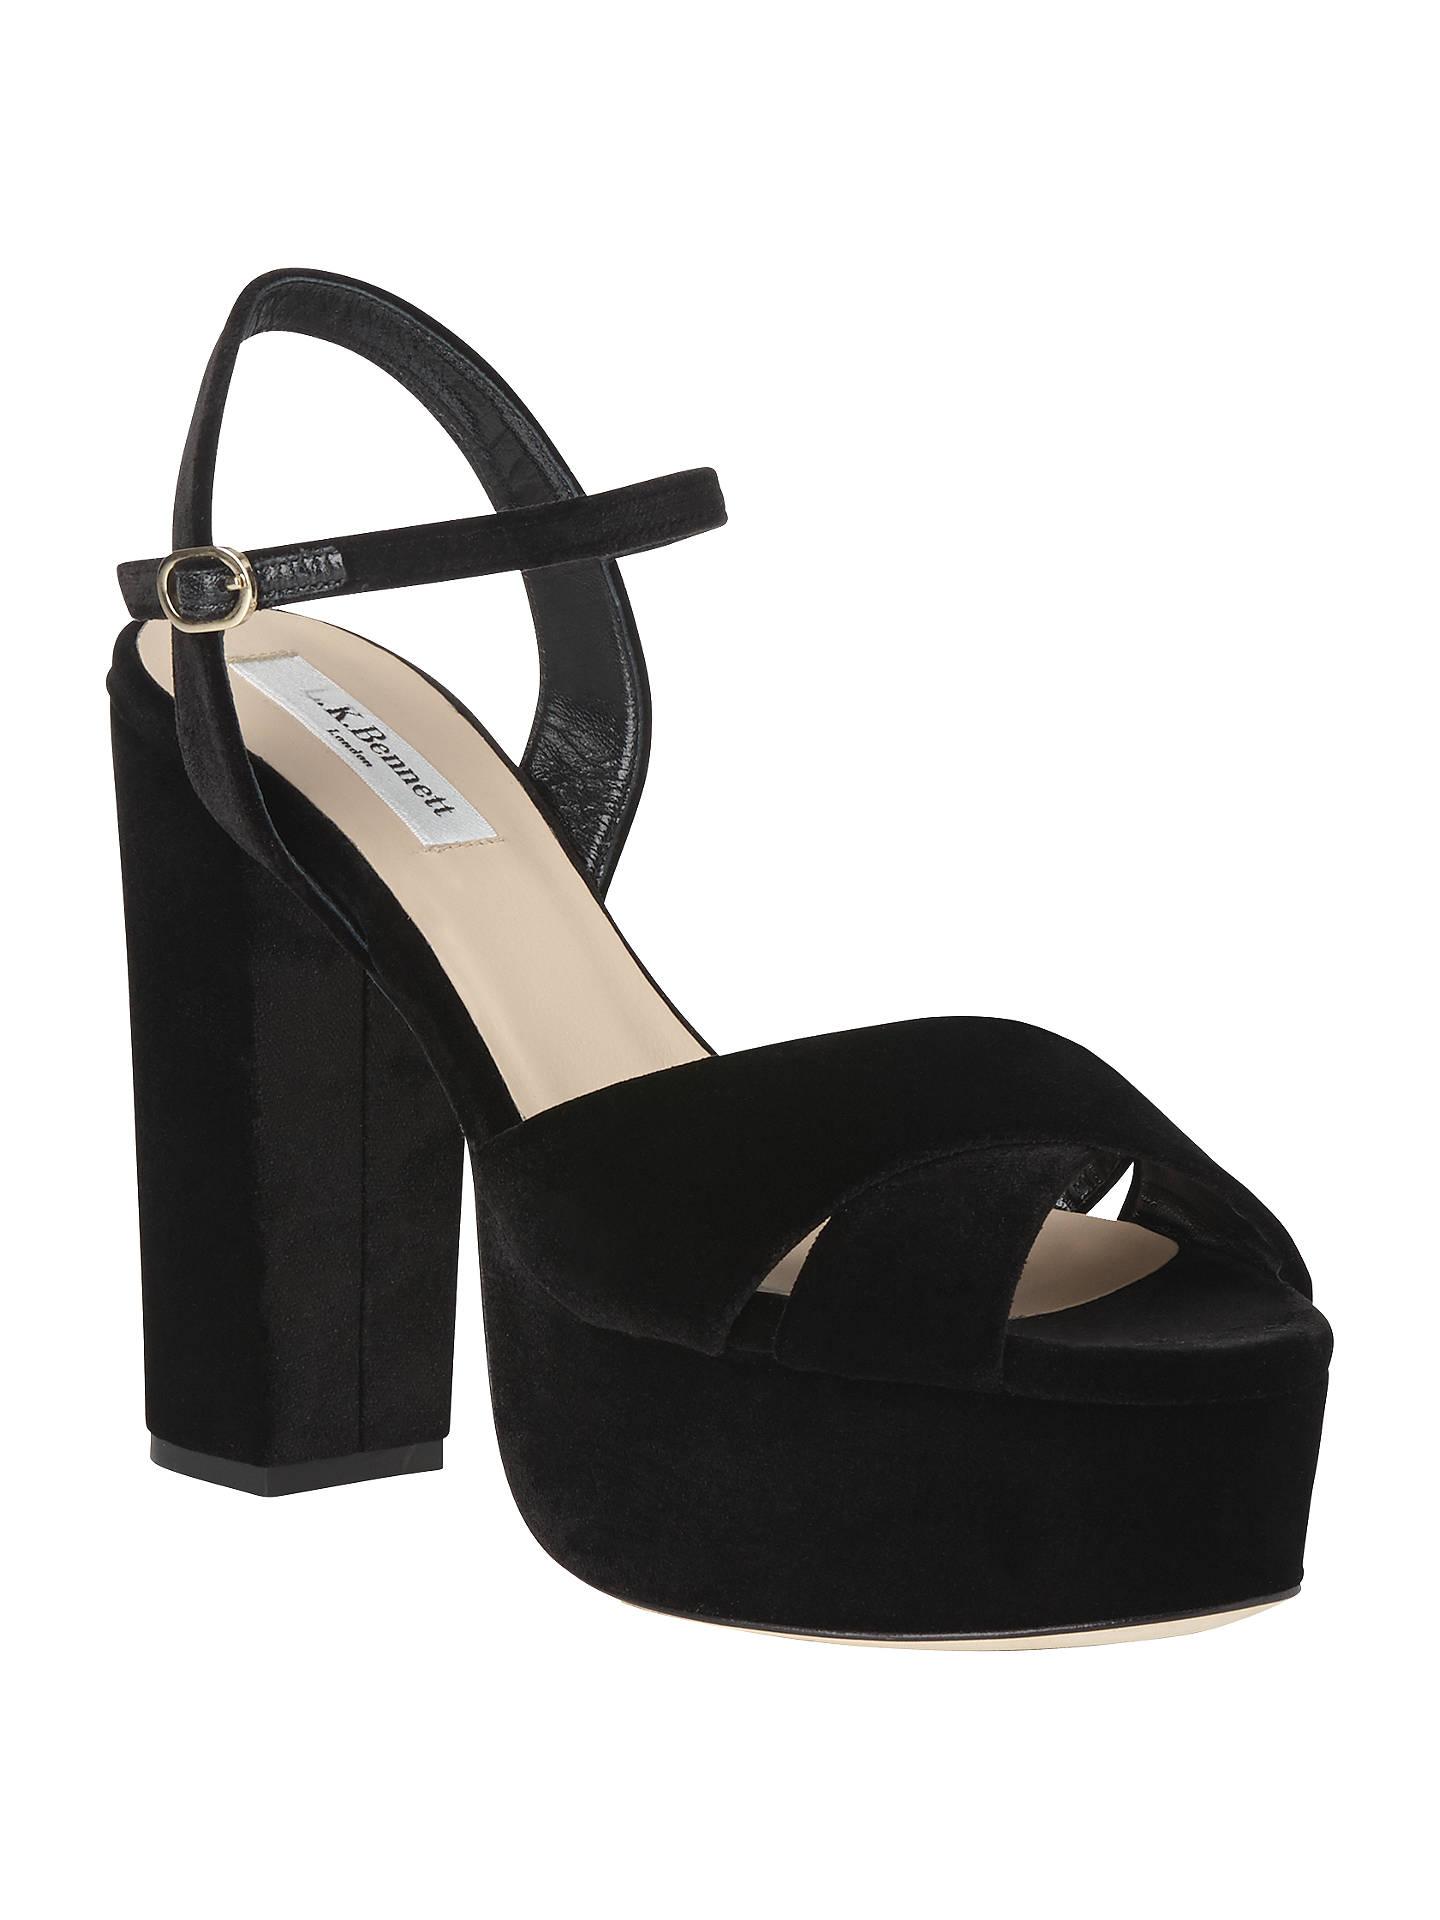 a8ff9c50f5e3 L.K. Bennett Elle High Block Heel Platform Sandals at John Lewis ...